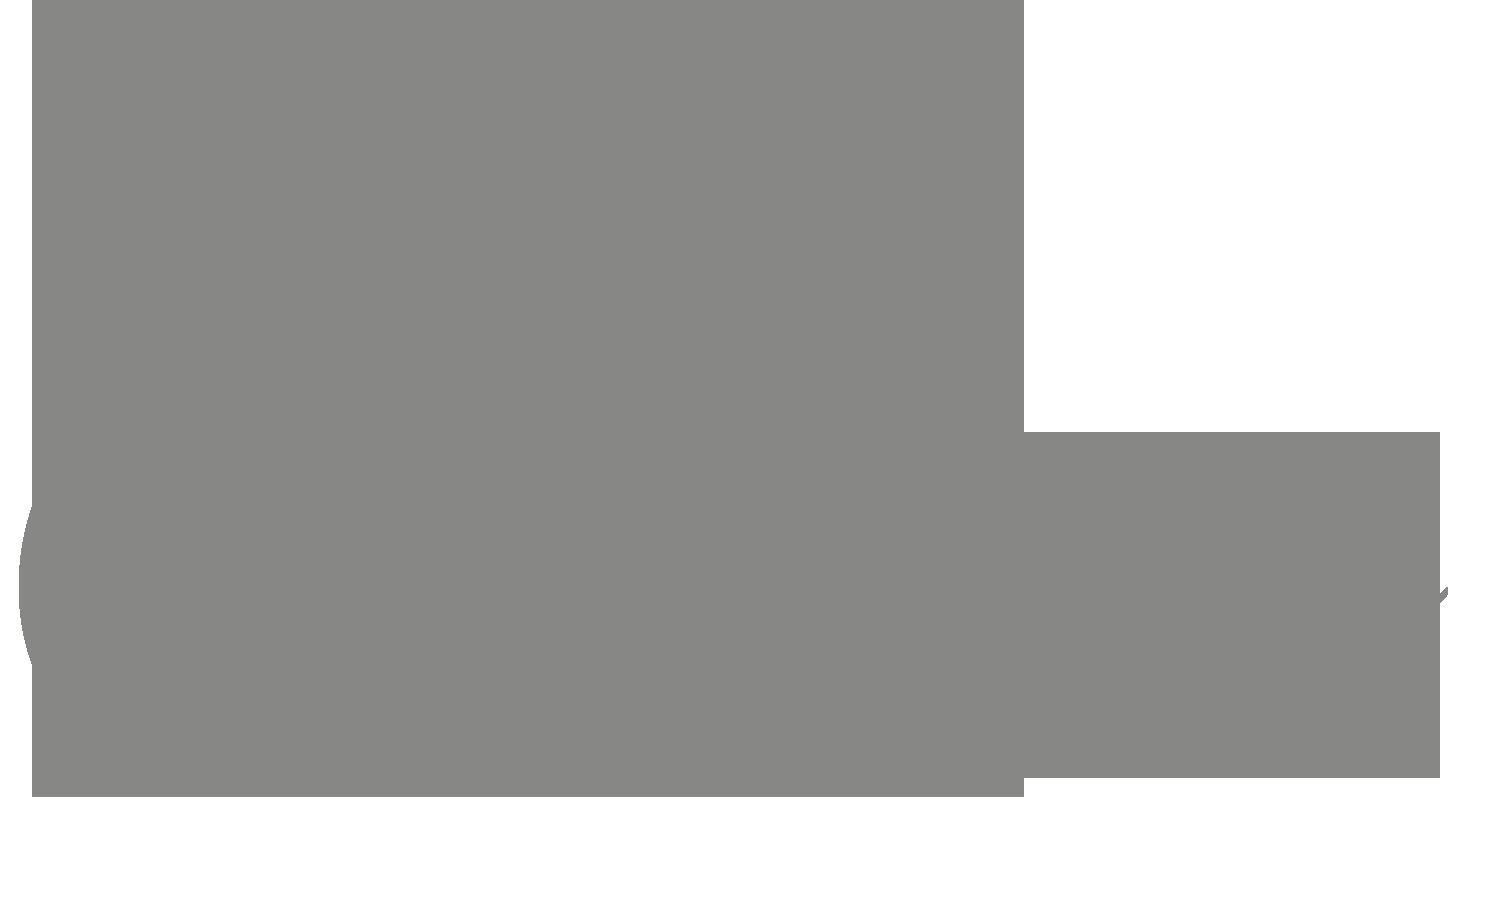 GEN Medicina | O seu portal de conteúdo